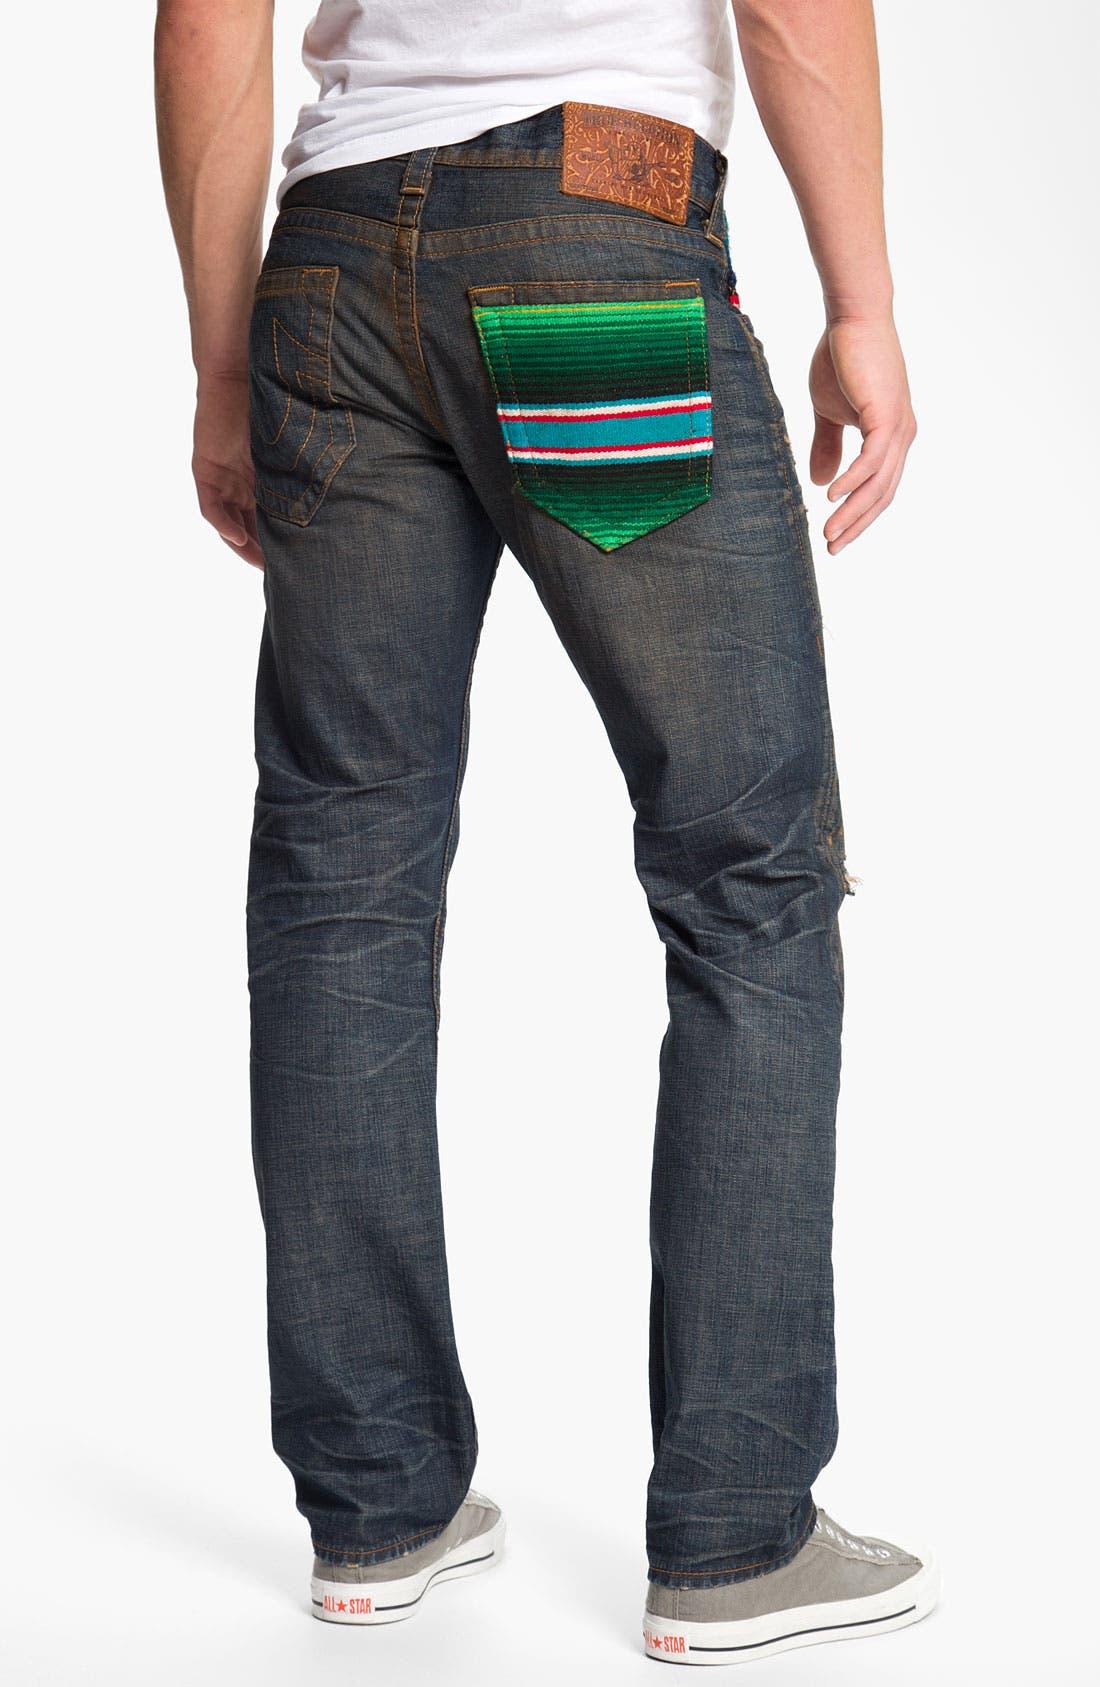 Alternate Image 1 Selected - True Religion Brand Jeans 'Geno Baja' Slim Straight Leg Jeans (Proclamation)